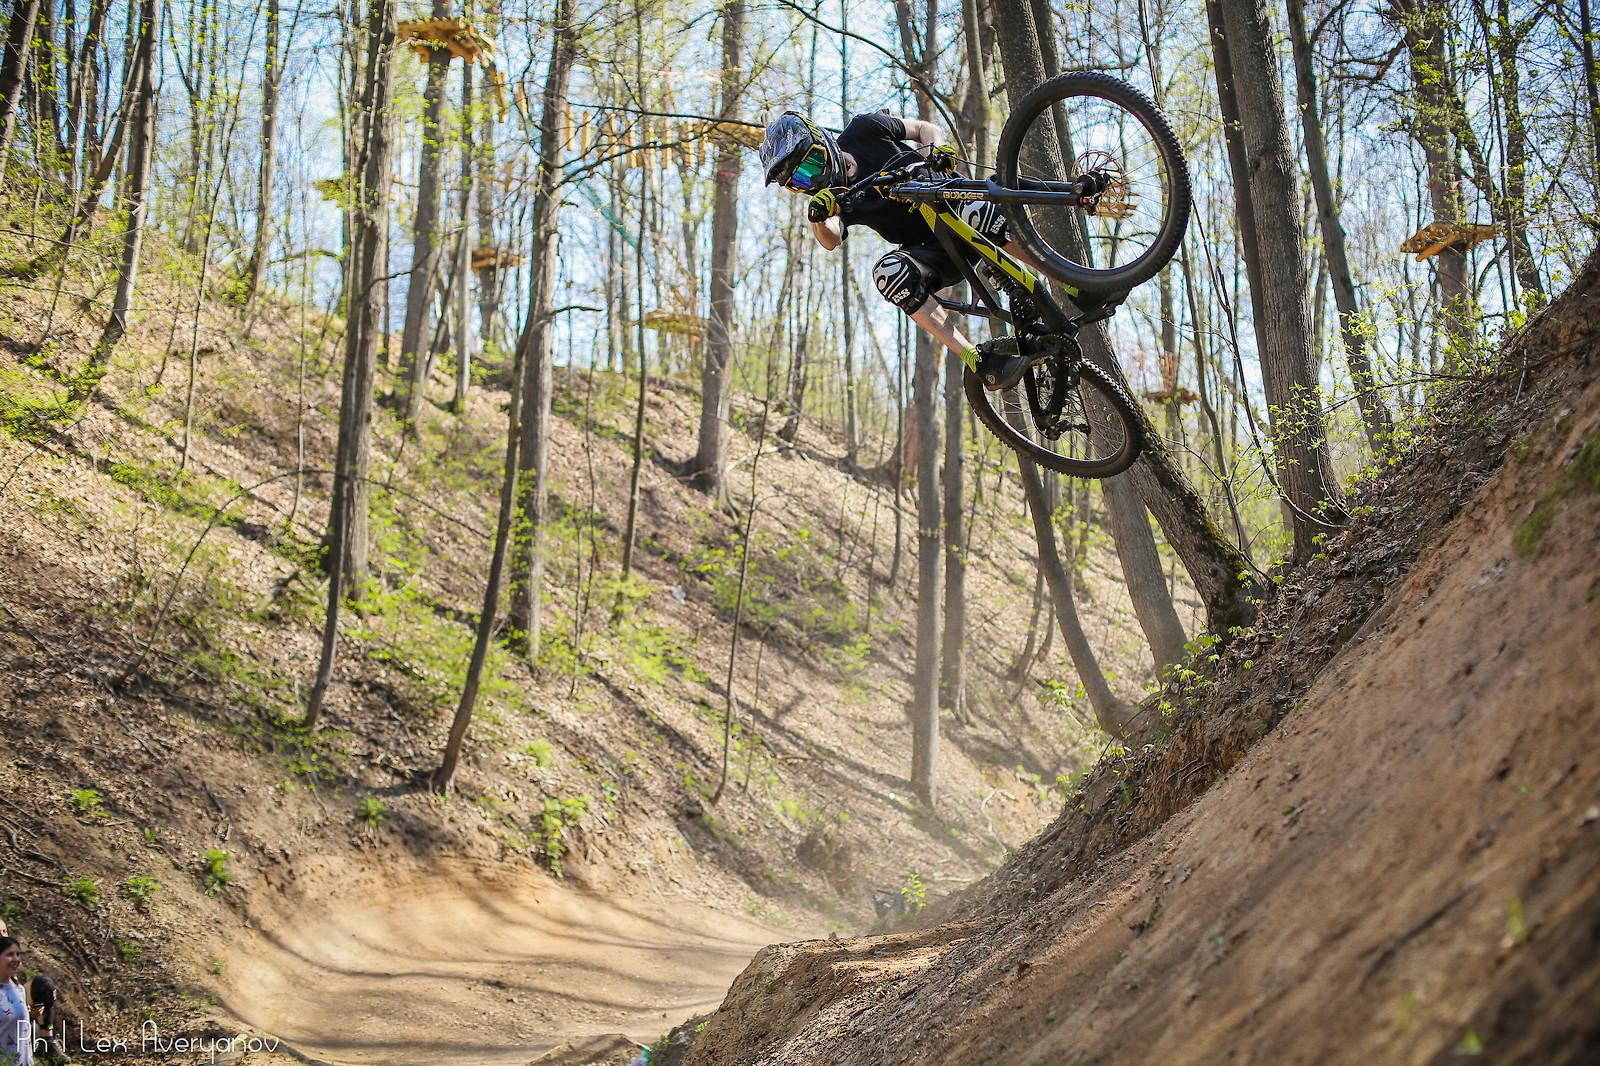 Now! season is open! - YakuT - Mountain Biking Pictures - Vital MTB